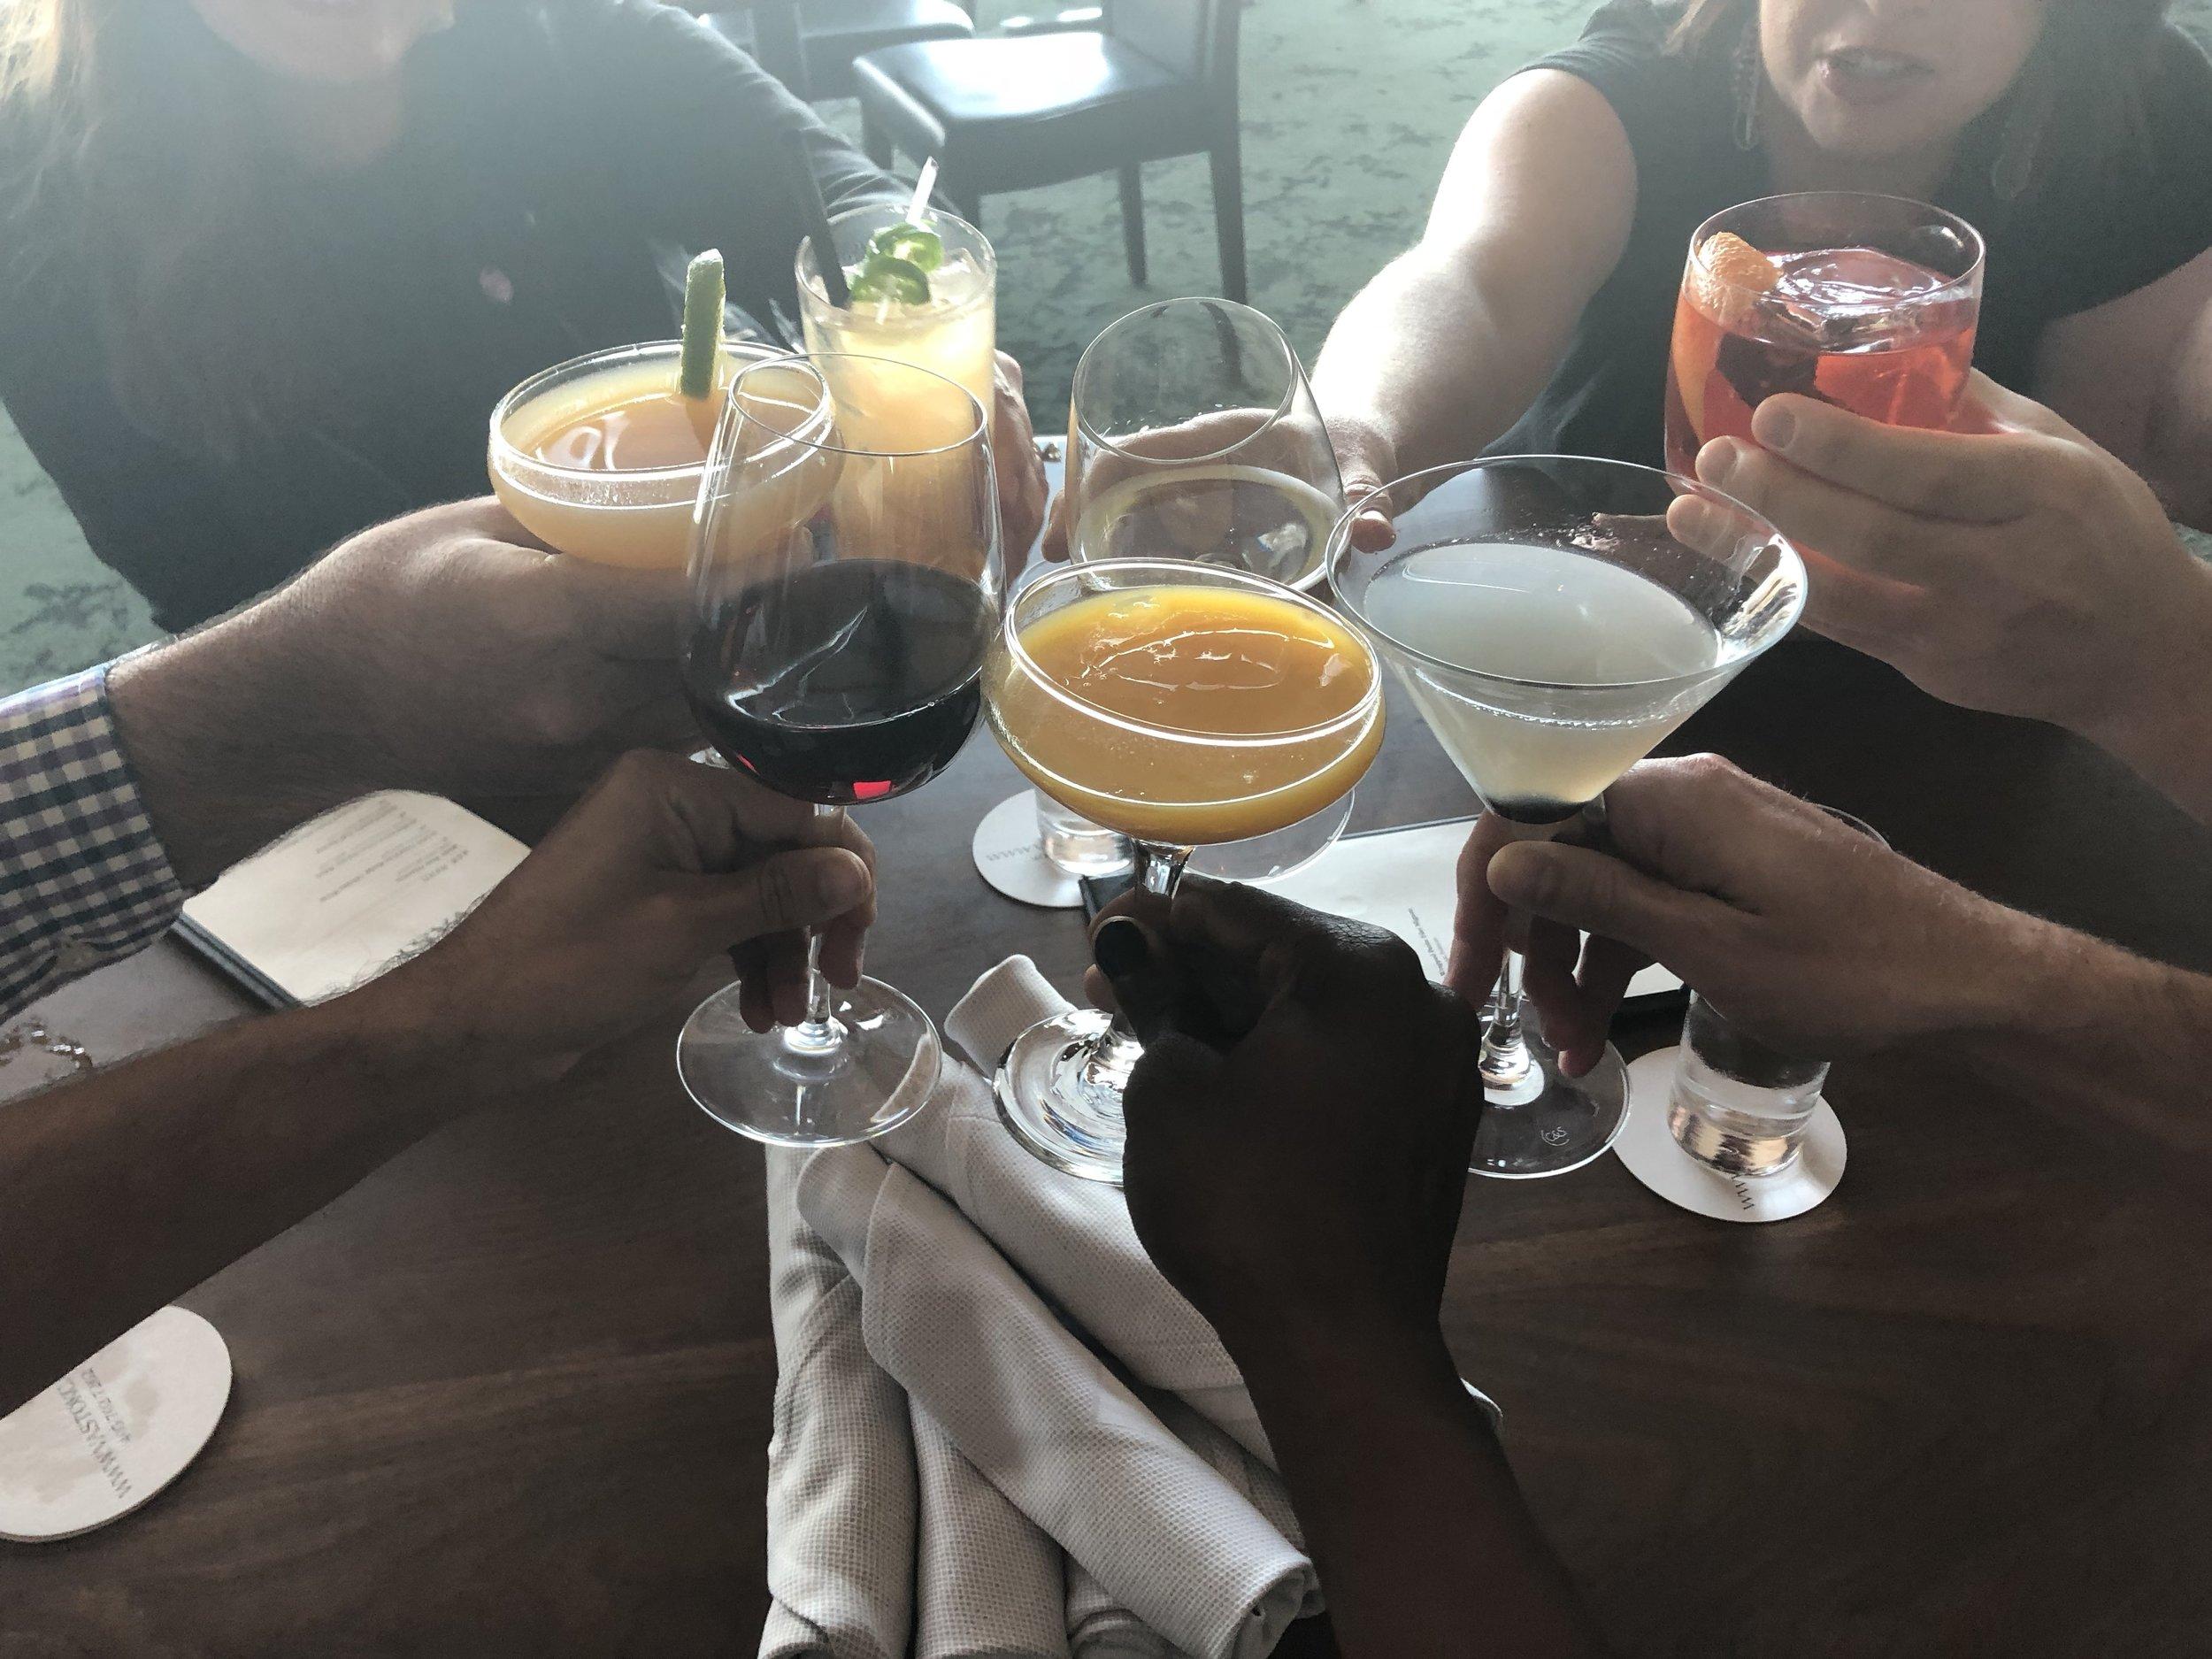 Cheers from Vast, a 49th-floor hotspot inside Devon Tower.